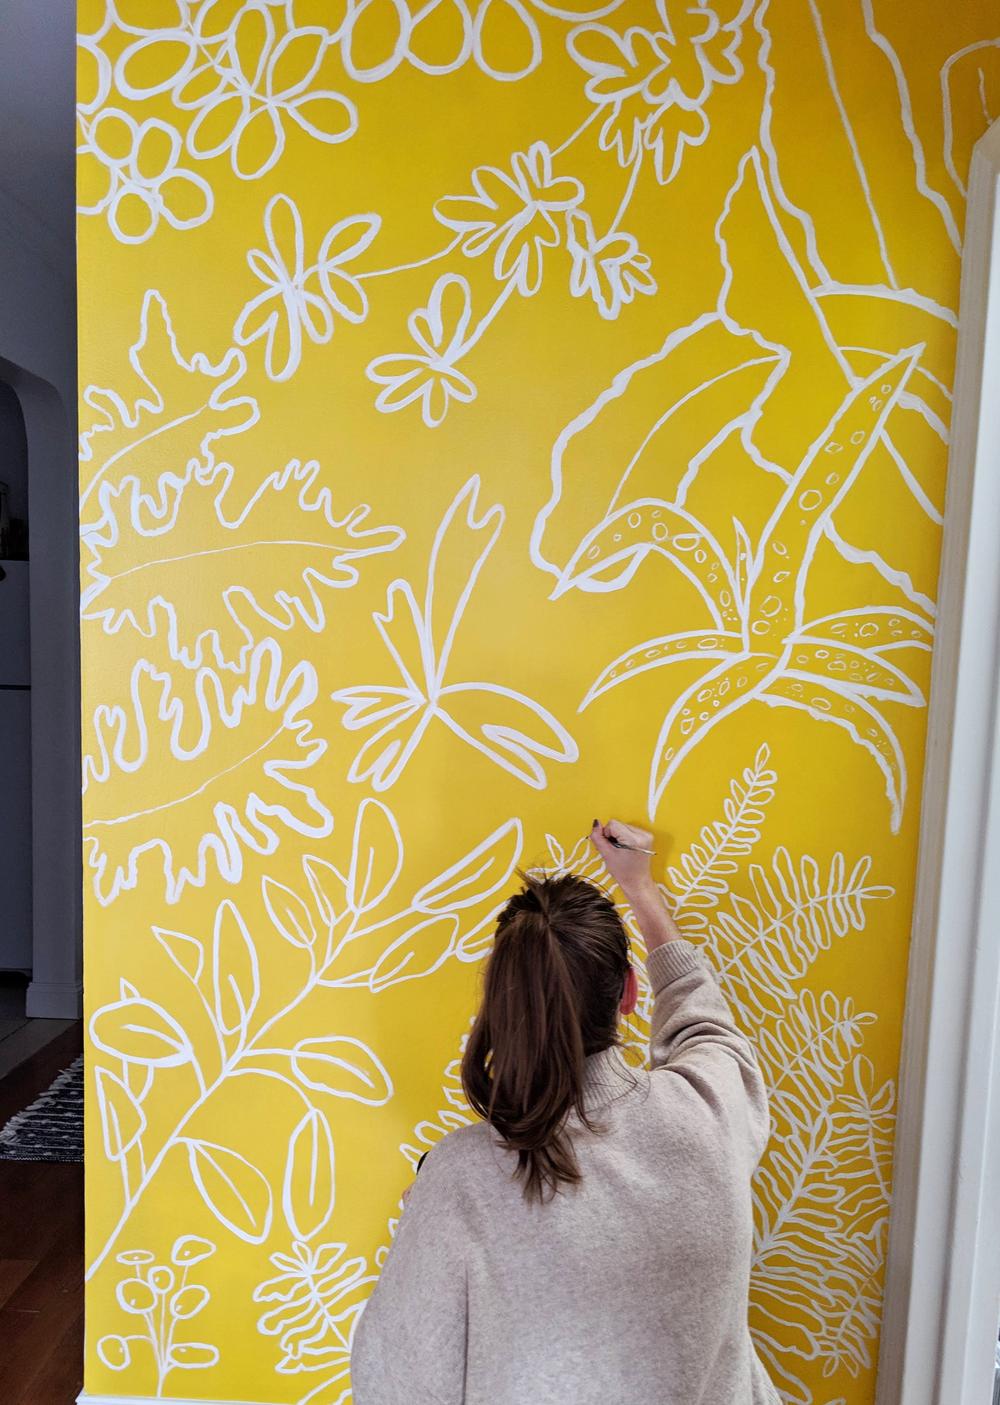 03 2019 Yellow Mural UES_1.png